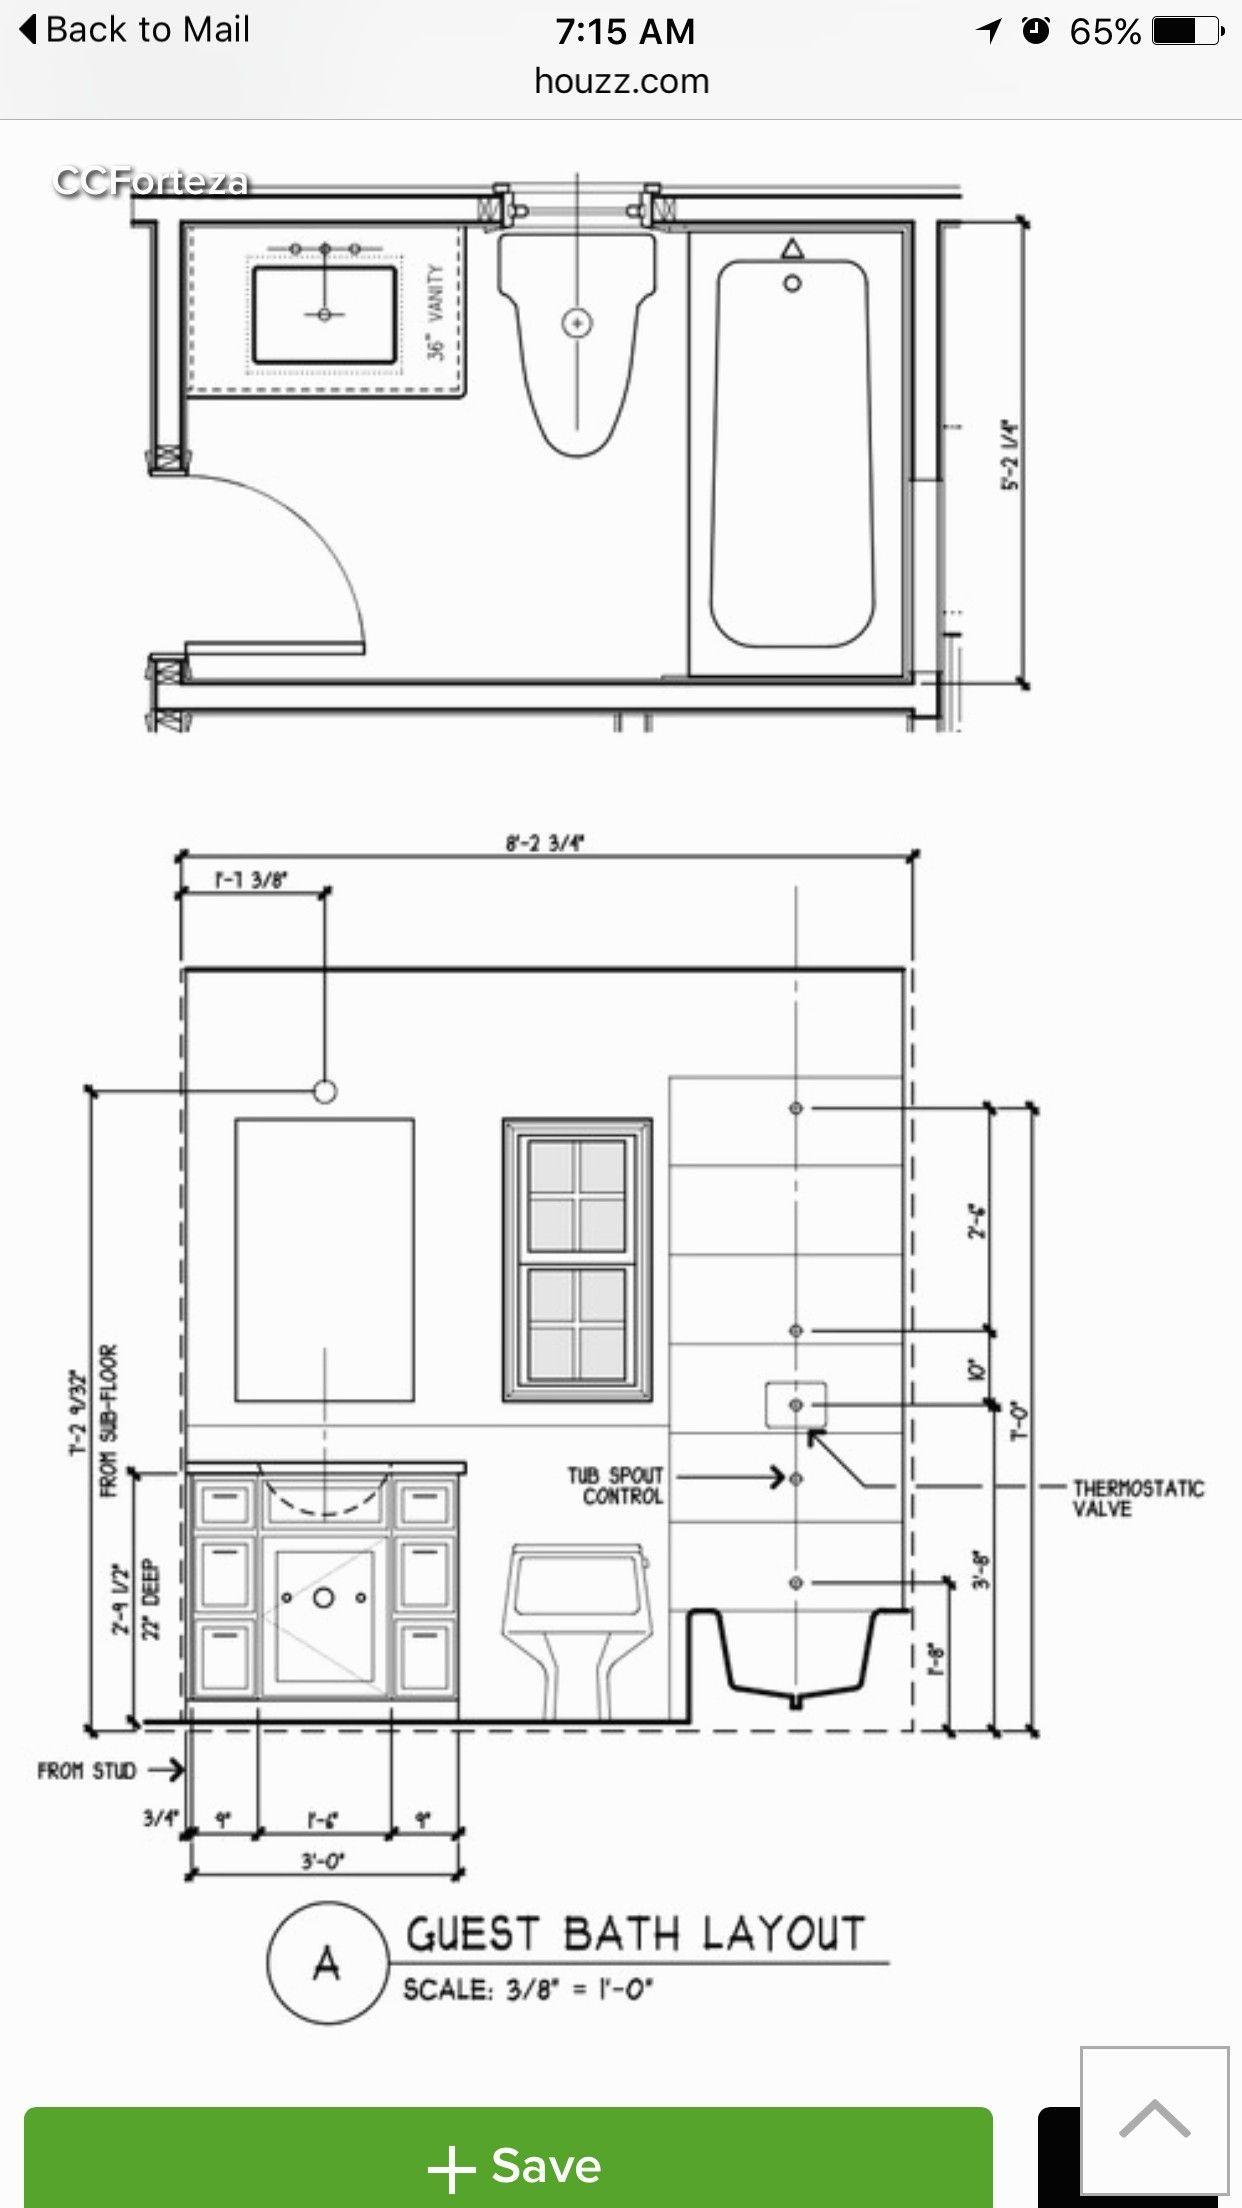 50 Photos 5 X 8 Bathroom Remodel Ideas With Simple Implementation Small Bathroom Layout Small Bathroom Floor Plans Bathroom Floor Plans